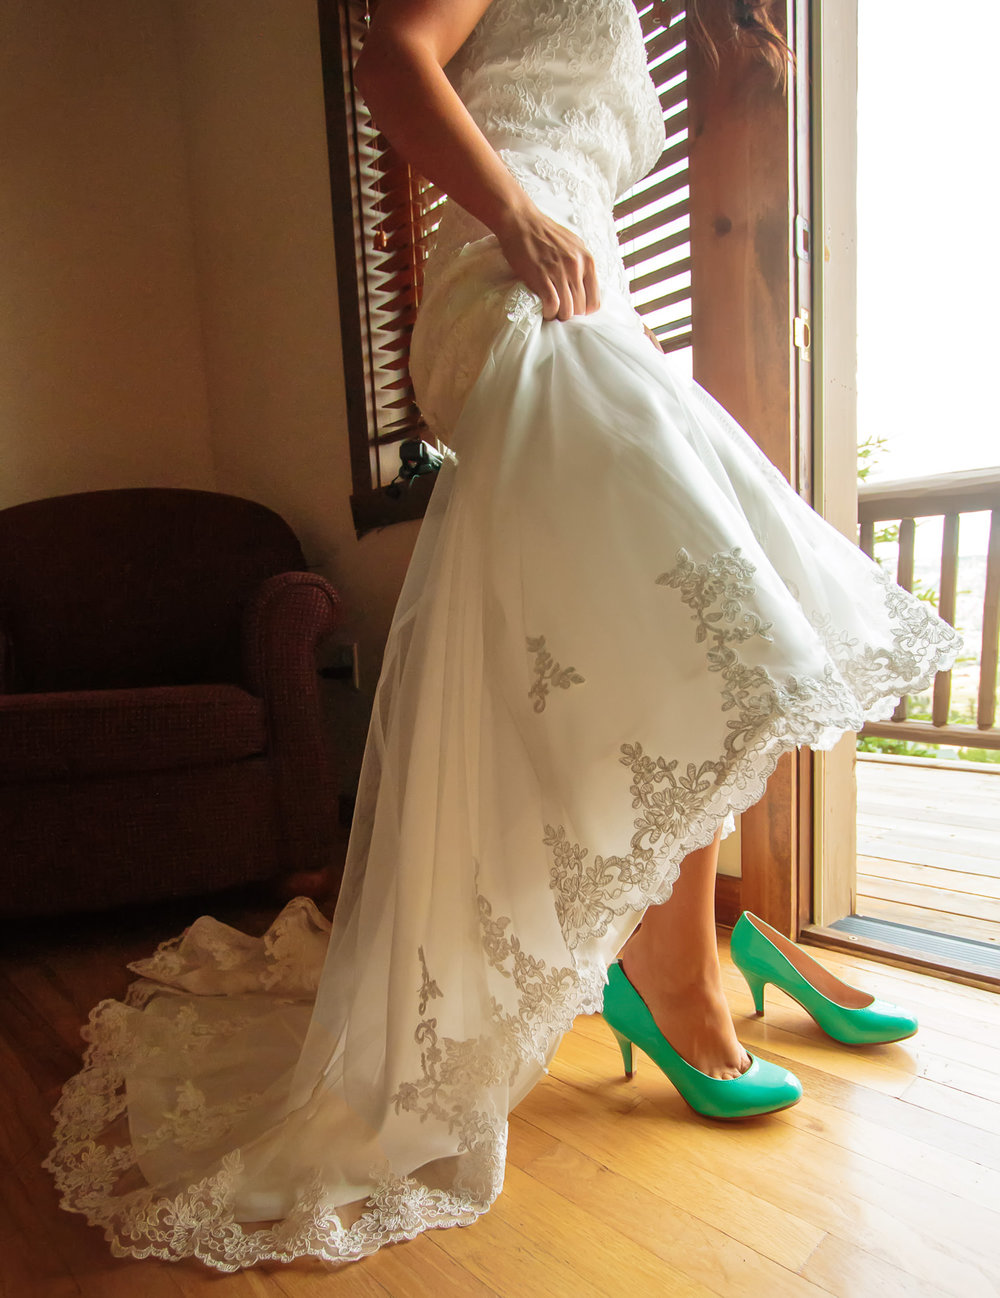 Bride slips into shoes during a Taharaa Mountain Lodge wedding in Estes Park, Colorado